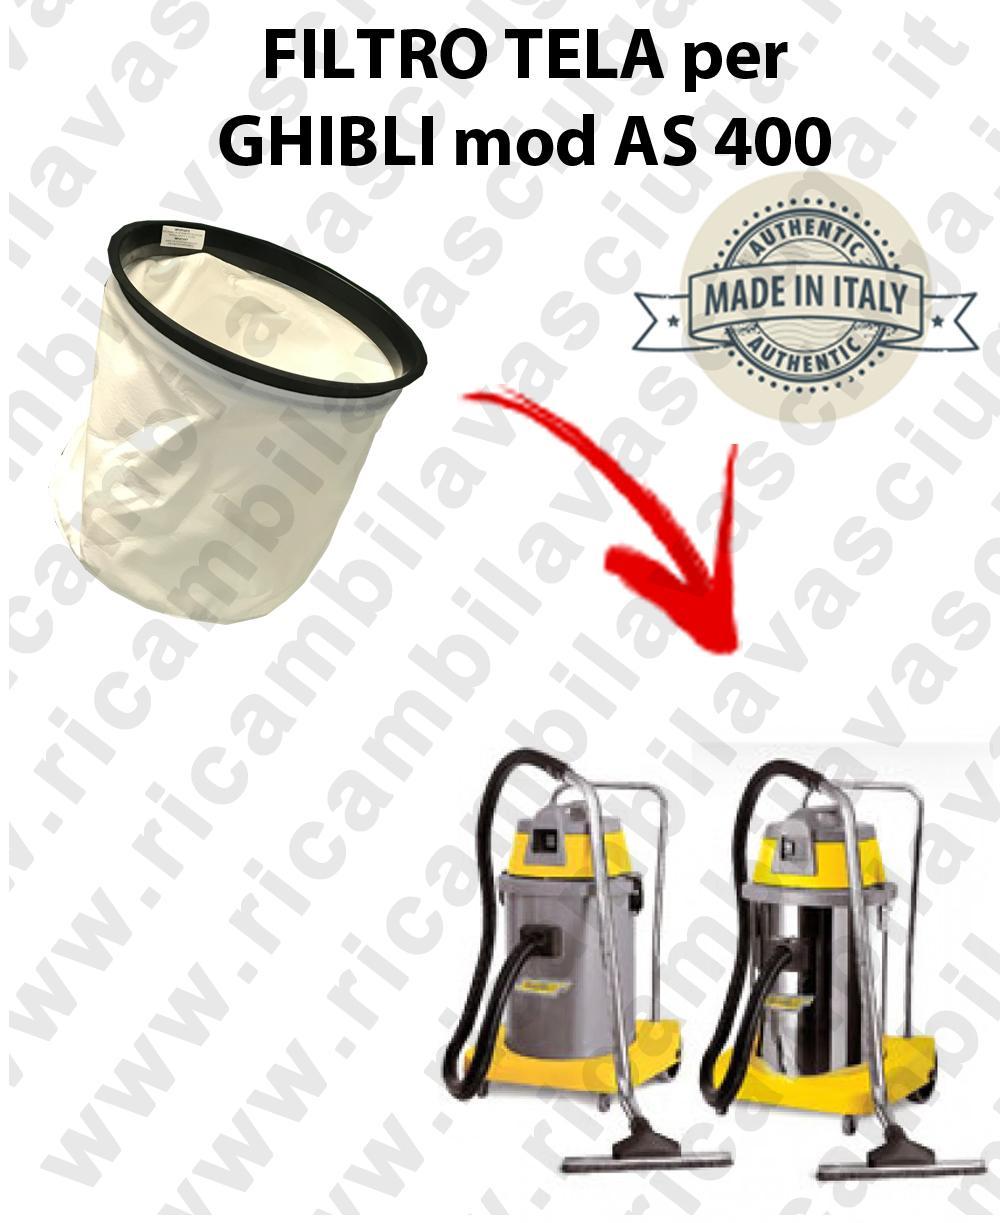 Filtro de tela para aspiradora GHIBLI Model AS 400